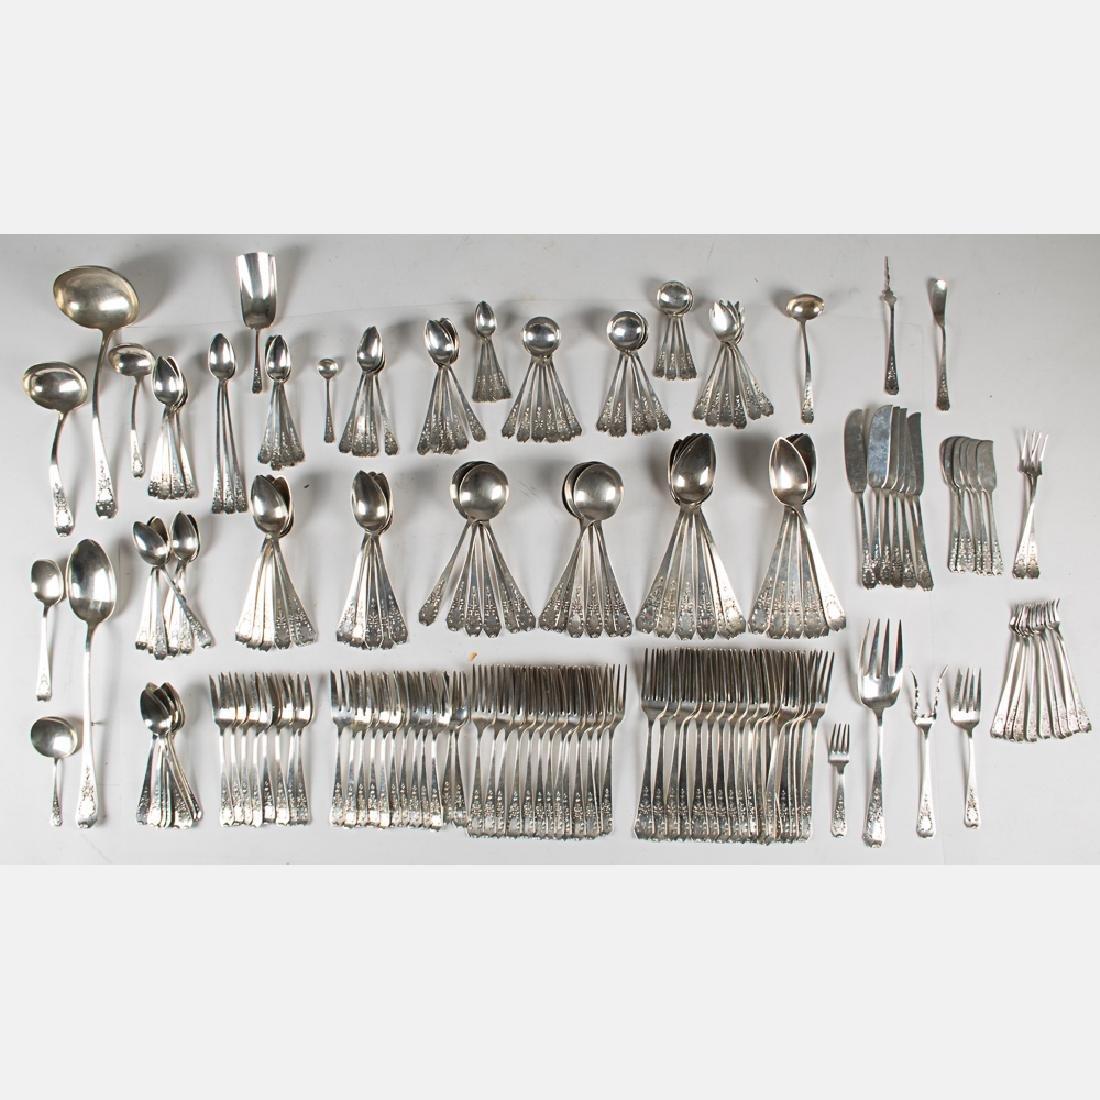 A Sterling Silver Gorham and International Flatware - 9